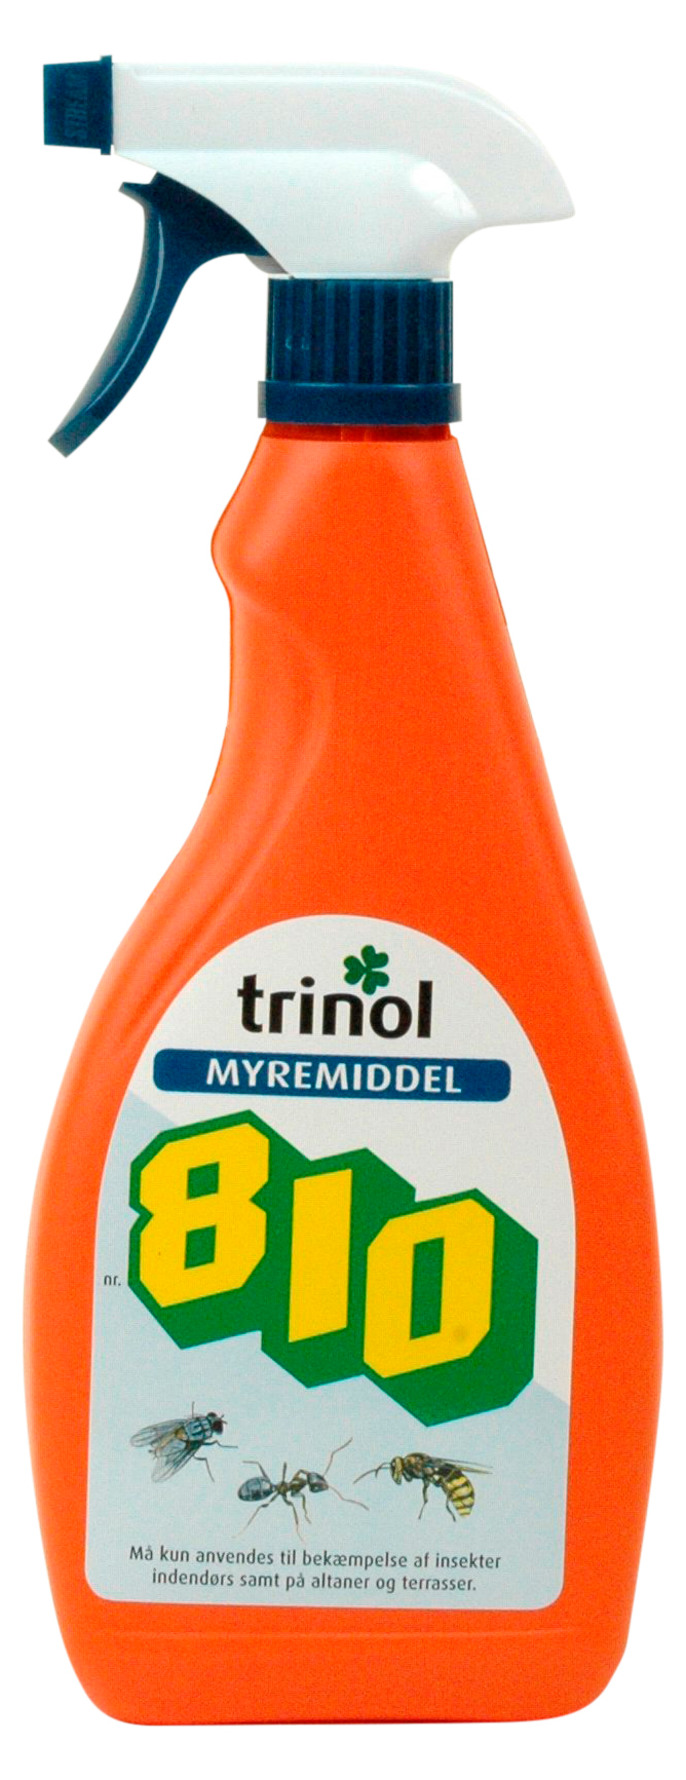 trinol 810 matas